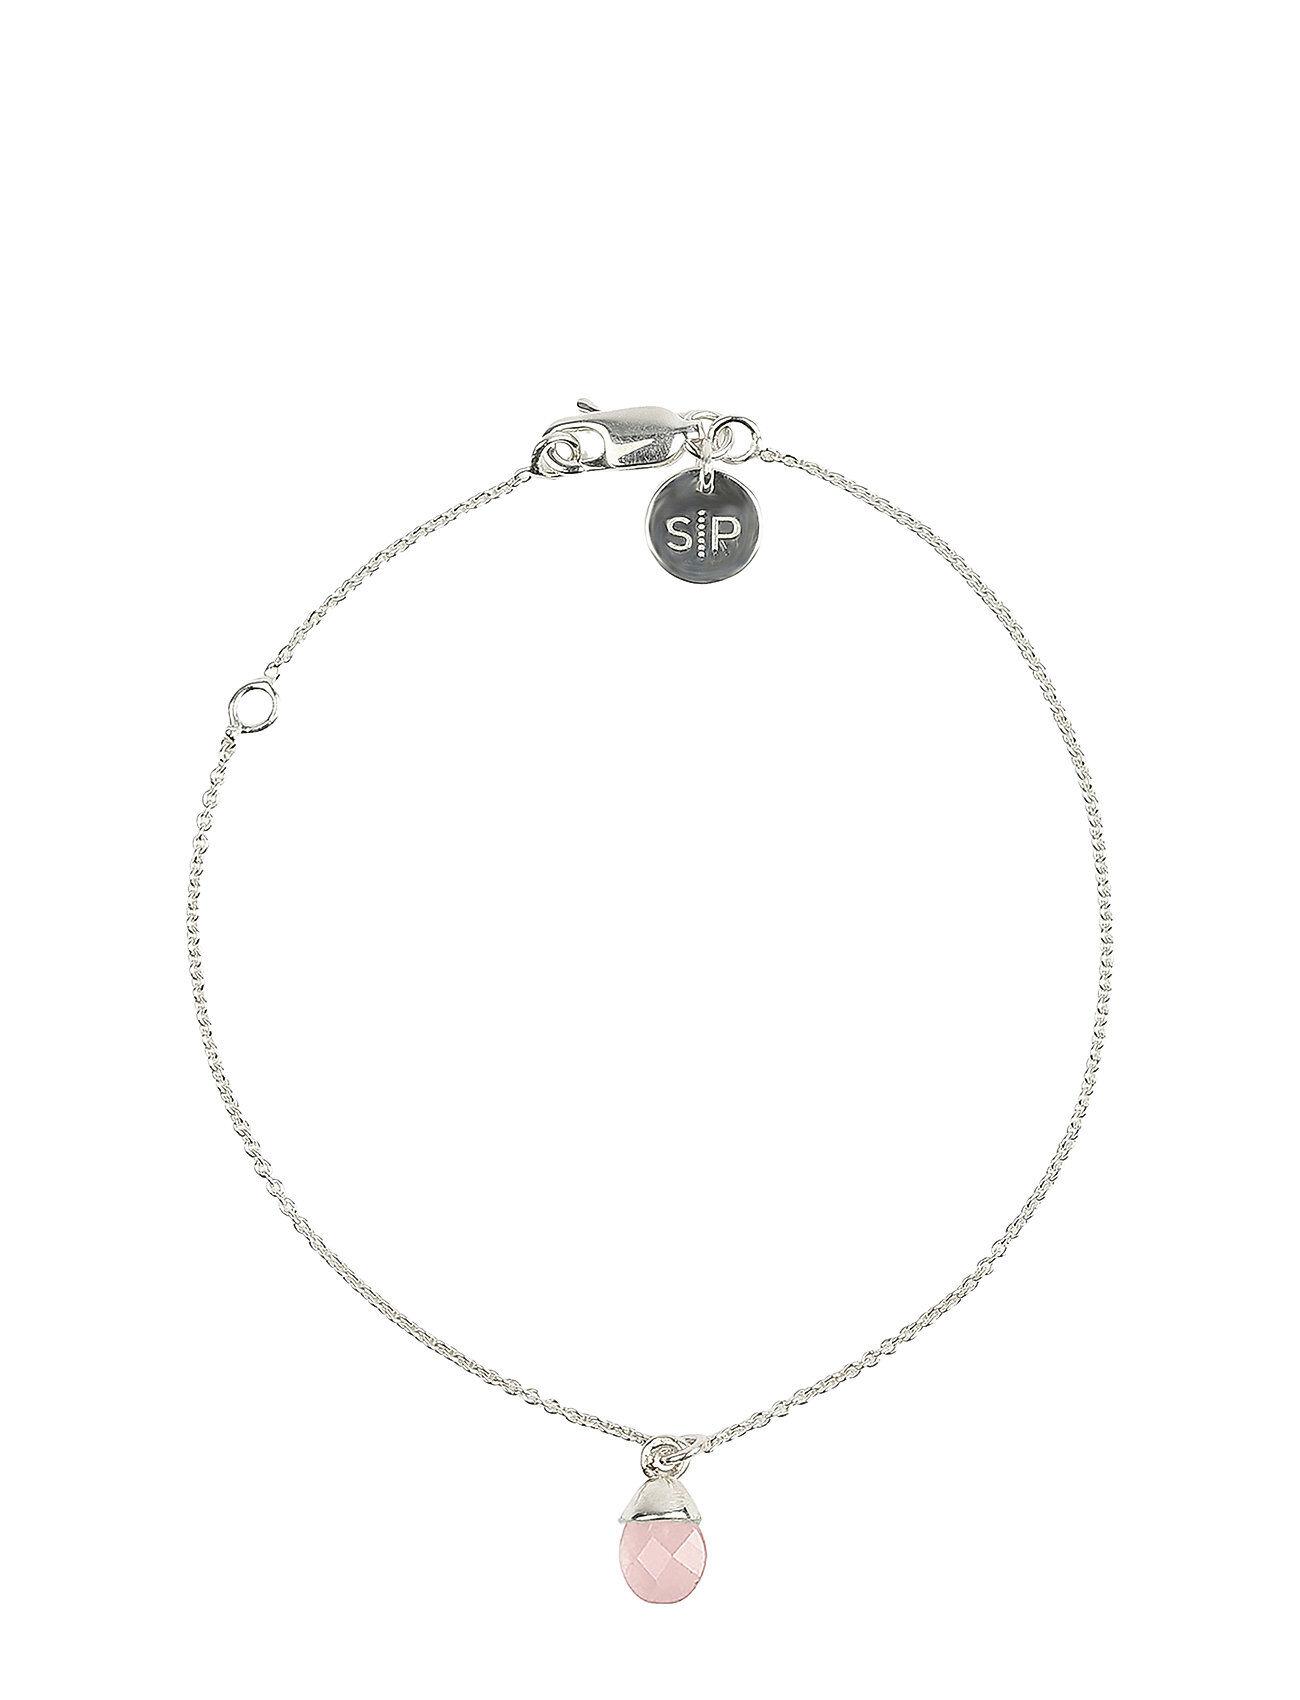 Syster P Mini Teardrop Bracelet Silver Accessories Jewellery Bracelets Chain Bracelets Hopea Syster P